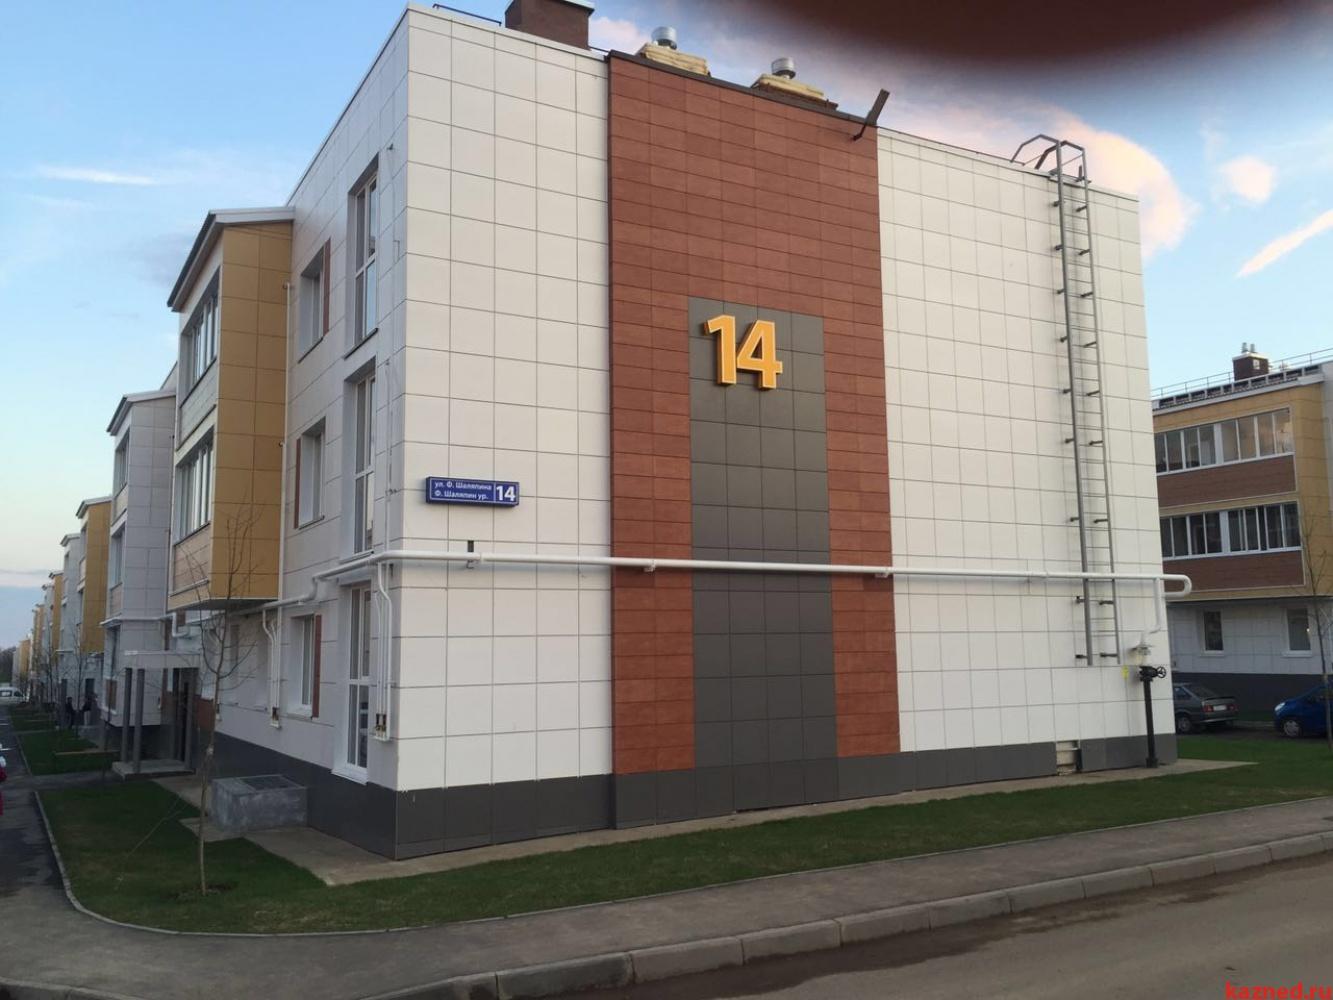 в ЖК Царево 2-ком квартира 51 кв.м. ул Шаляпина 14 (миниатюра №1)